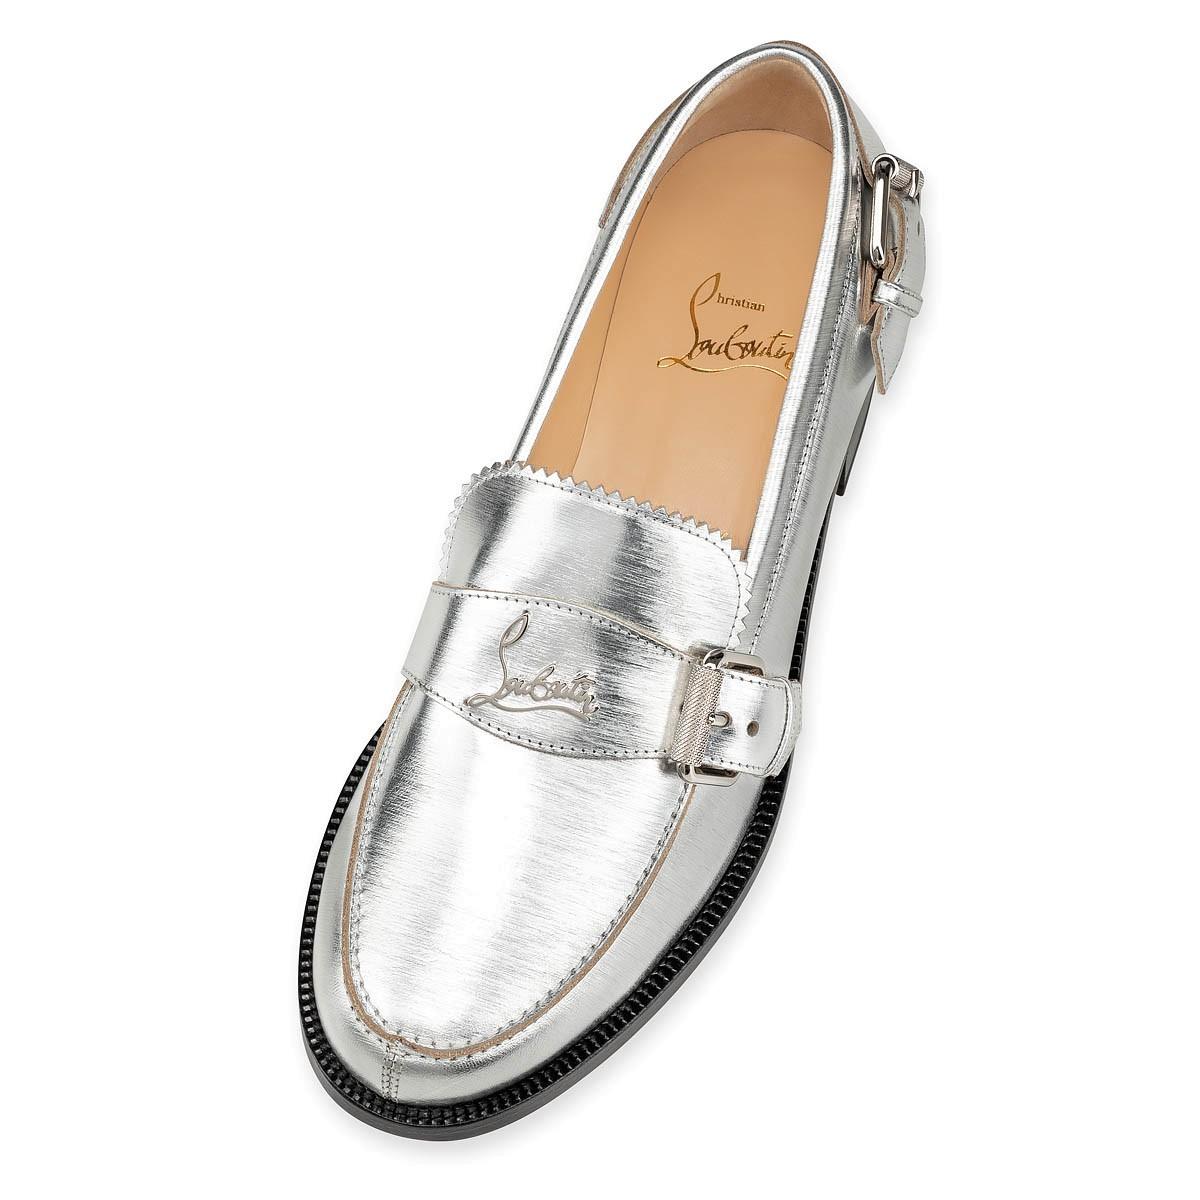 Shoes - Monmoc Donna - Christian Louboutin